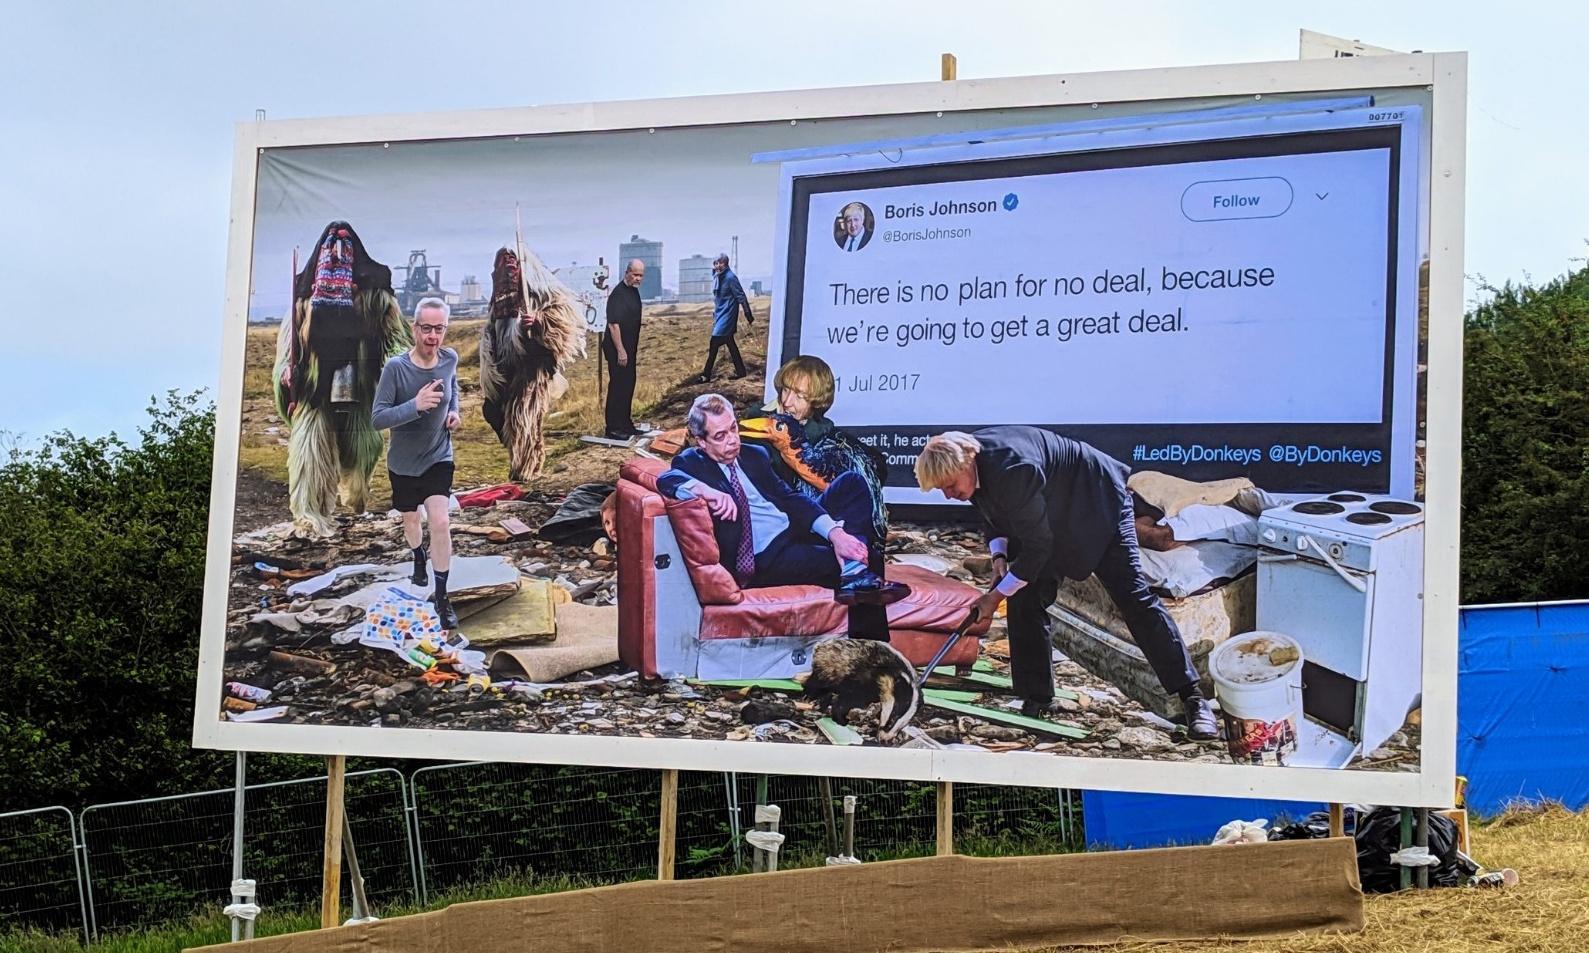 'Unwanted': Glastonbury festival's message to Boris Johnson